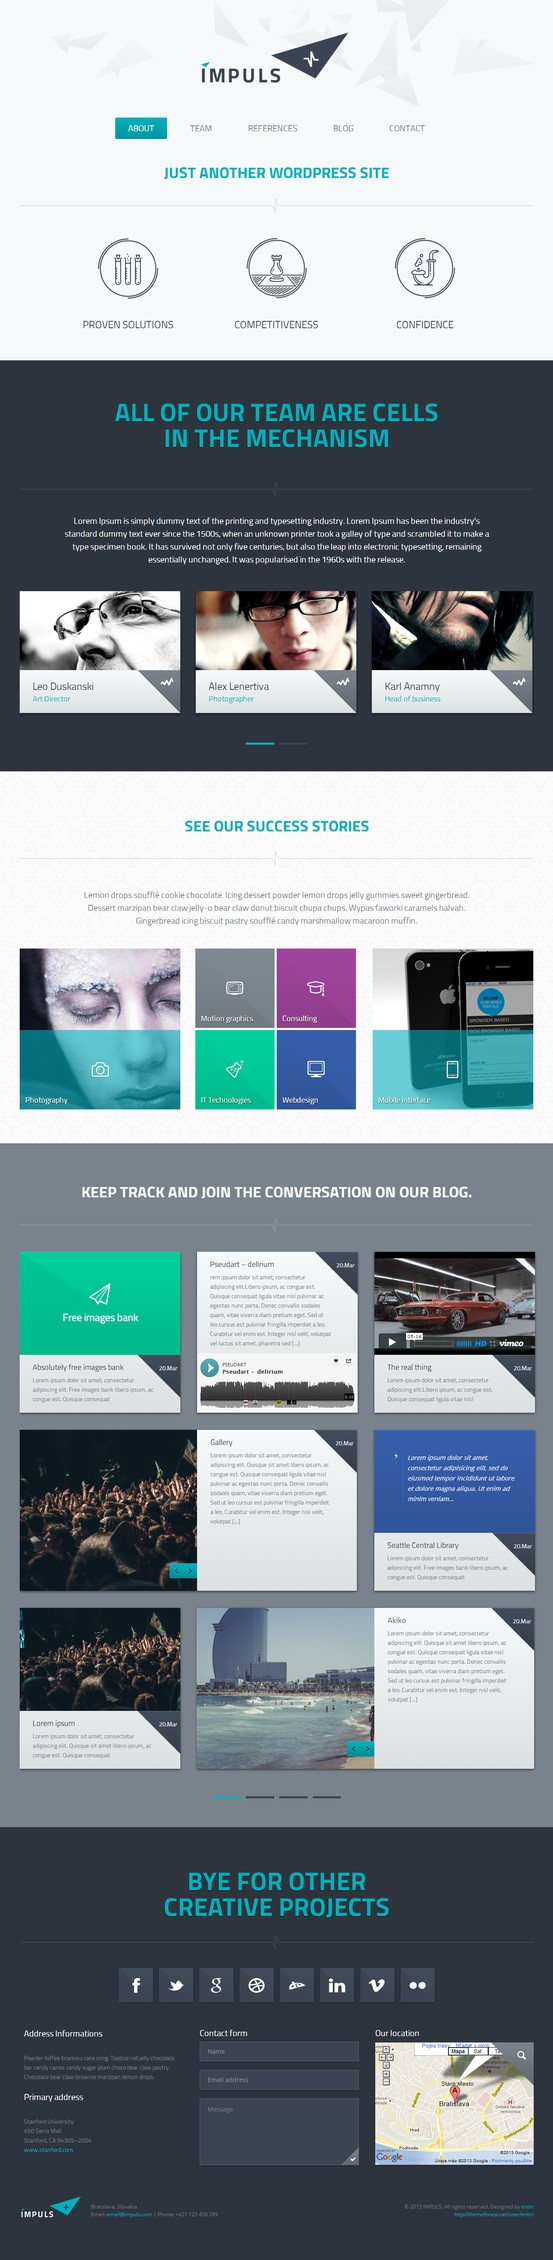 Impuls Wordpress Responsive Theme Wordpress Theme Website Template Responsive Design Webdesign Flat Flatdesign Portfolio O Web Design Design Apps